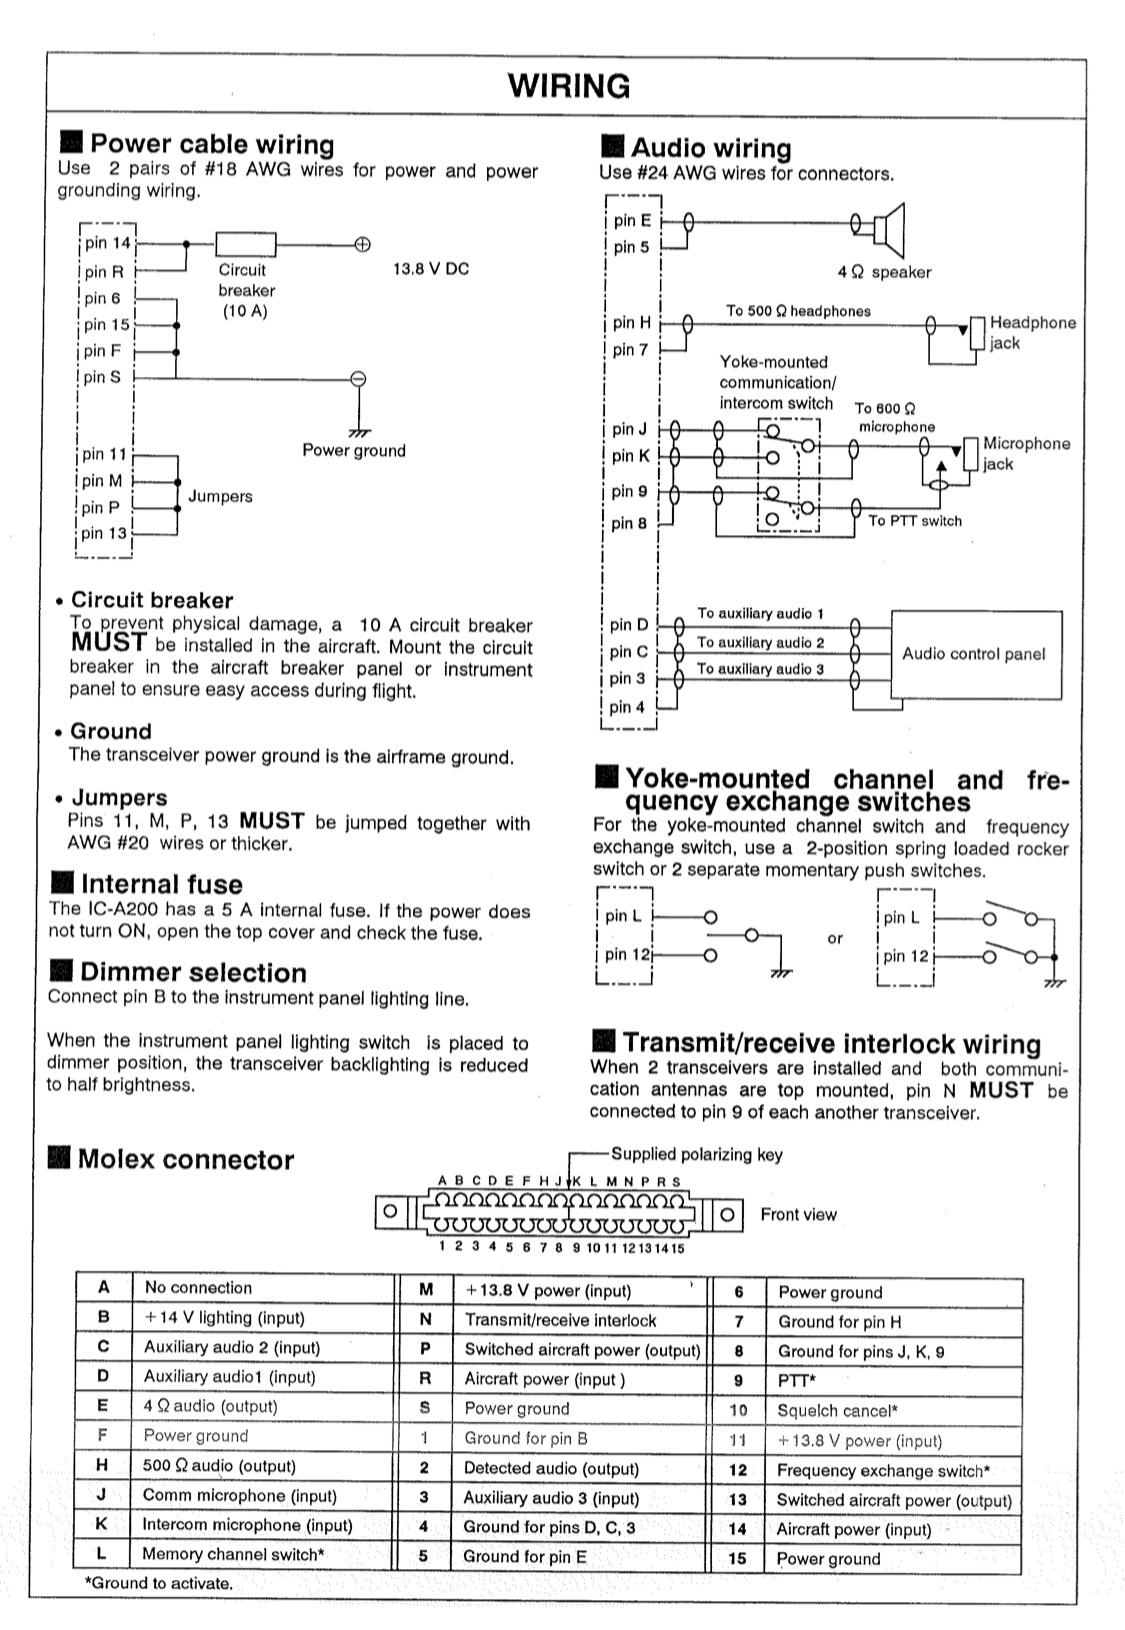 [DIAGRAM_4PO]  DIAGRAM] Mitsubishi A200 Wiring Diagram FULL Version HD Quality Wiring  Diagram - ECOSYSTEMWIRING.CONCESSIONARIABELOGISENIGALLIA.IT | Icom A210 Wiring Diagram |  | concessionariabelogisenigallia.it